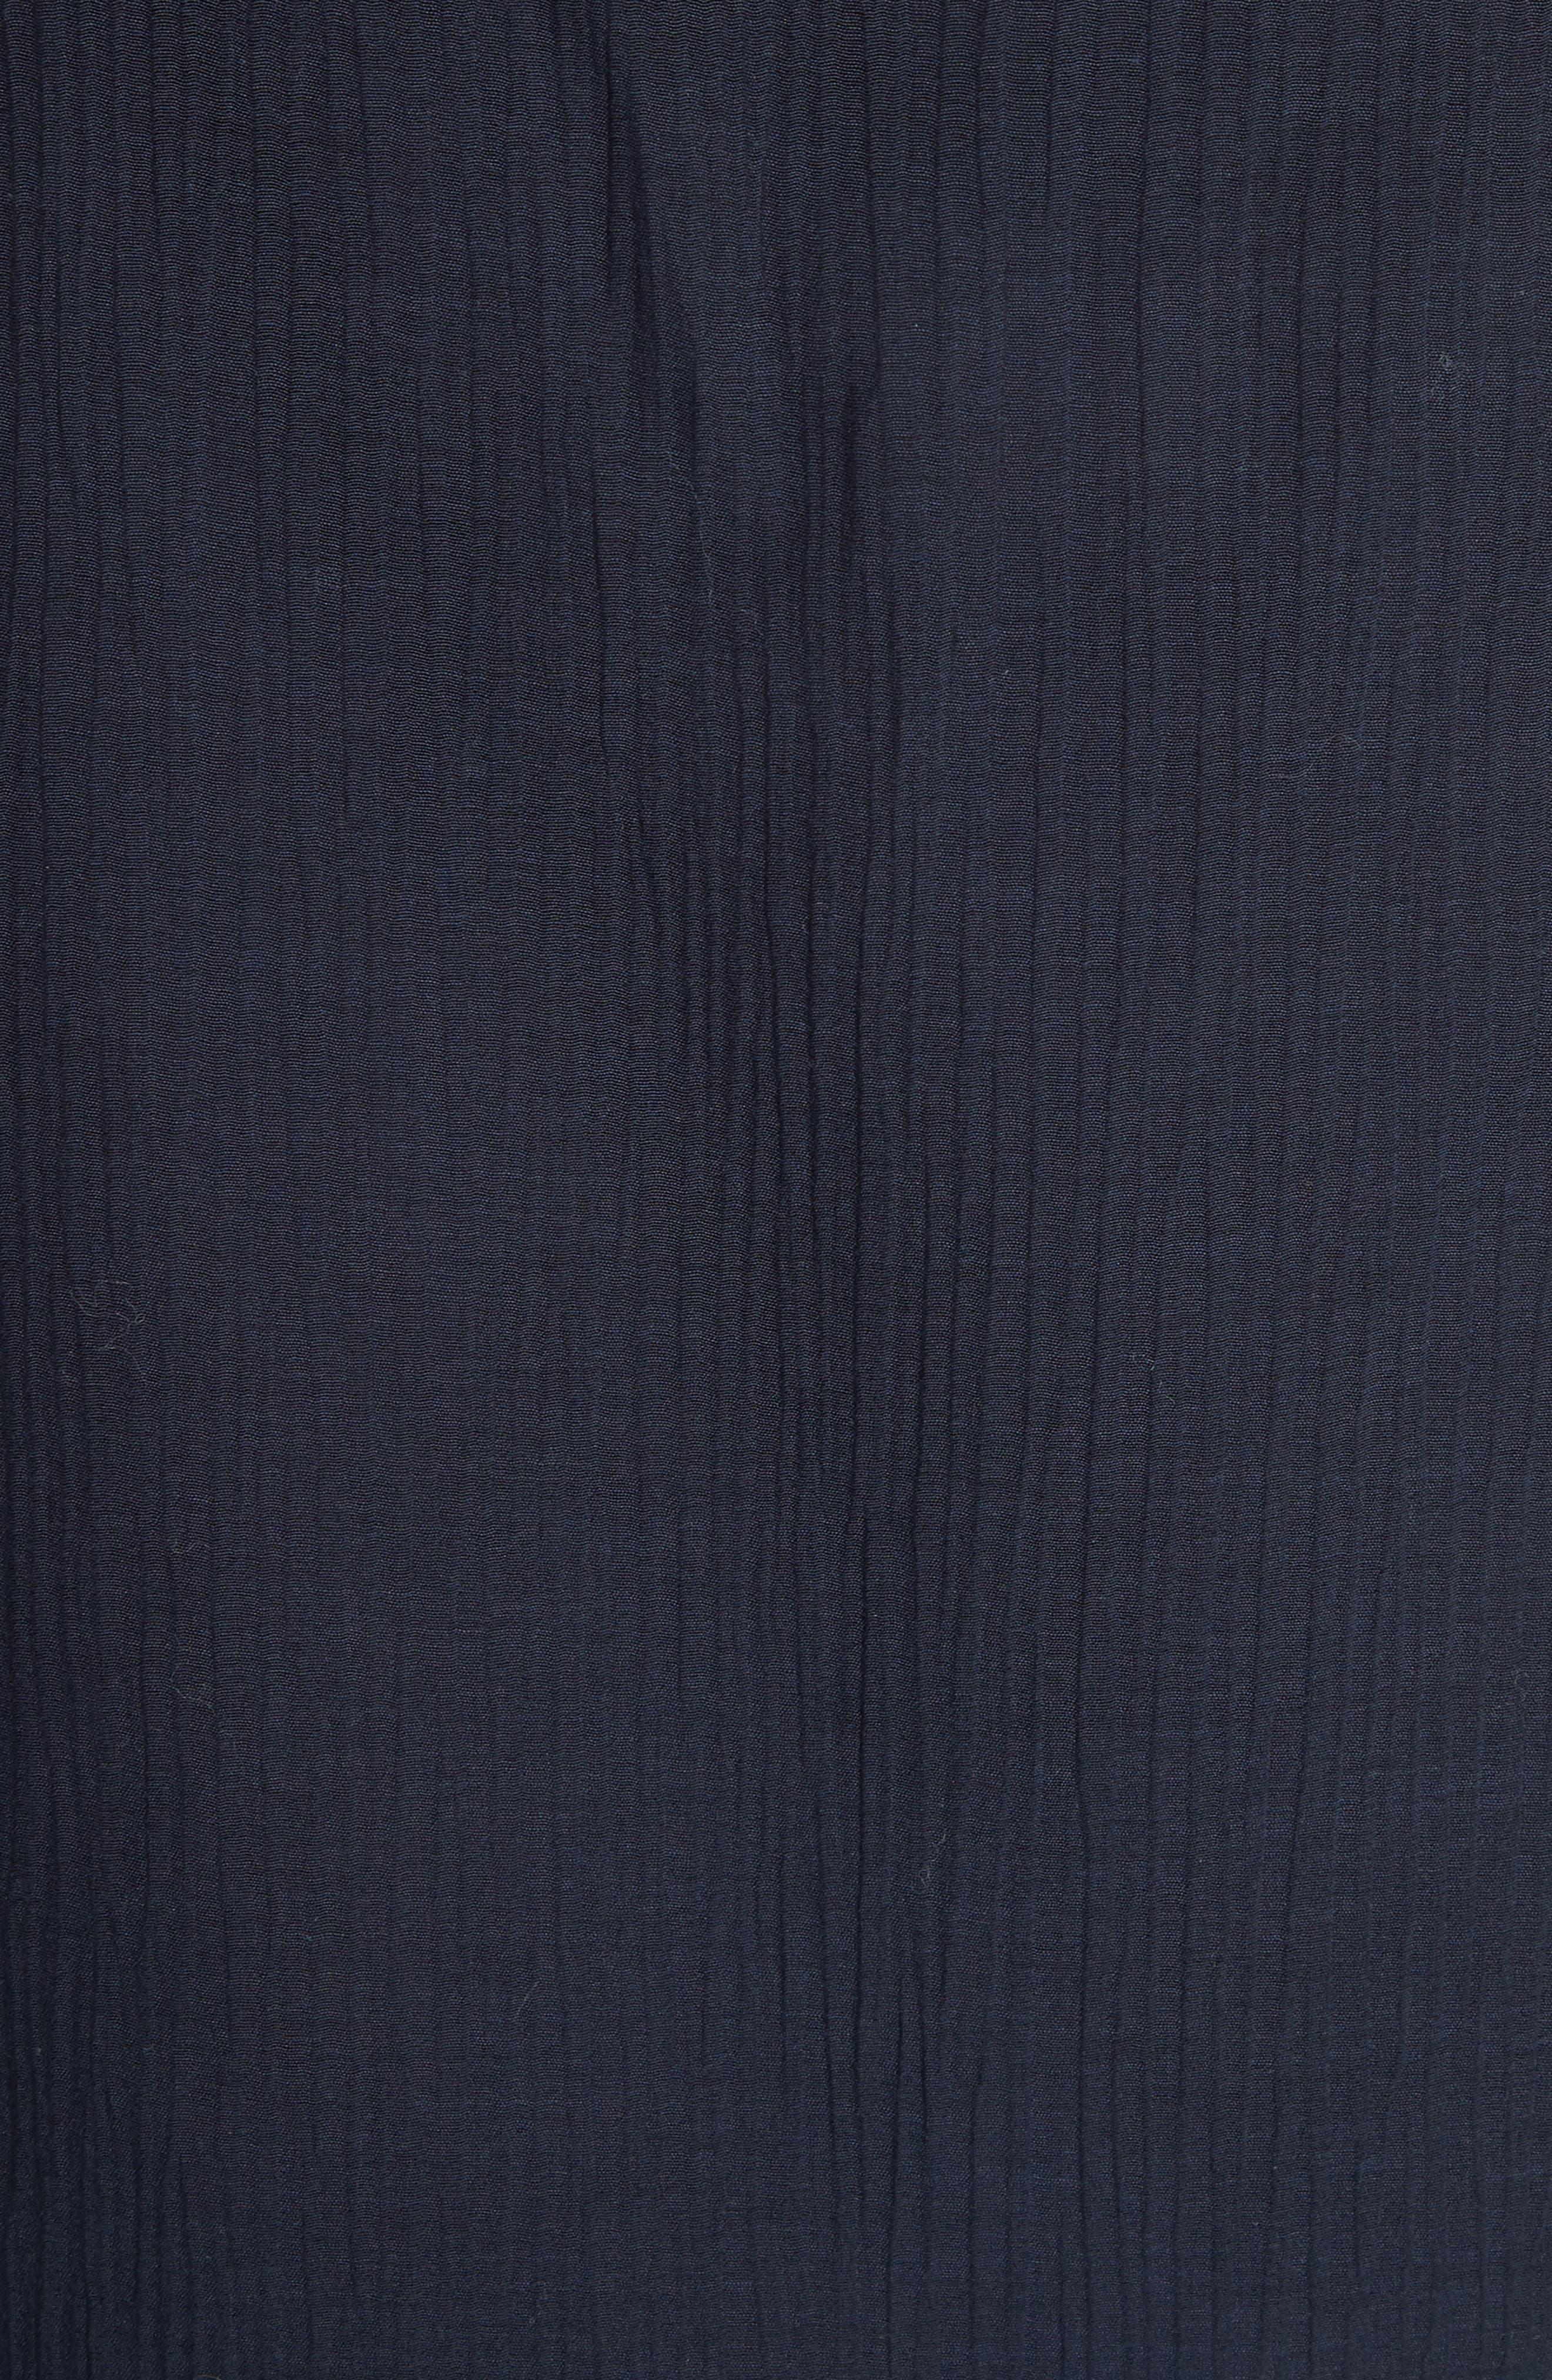 Cotton & Silk Ruffle Top,                             Alternate thumbnail 6, color,                             Eclipse